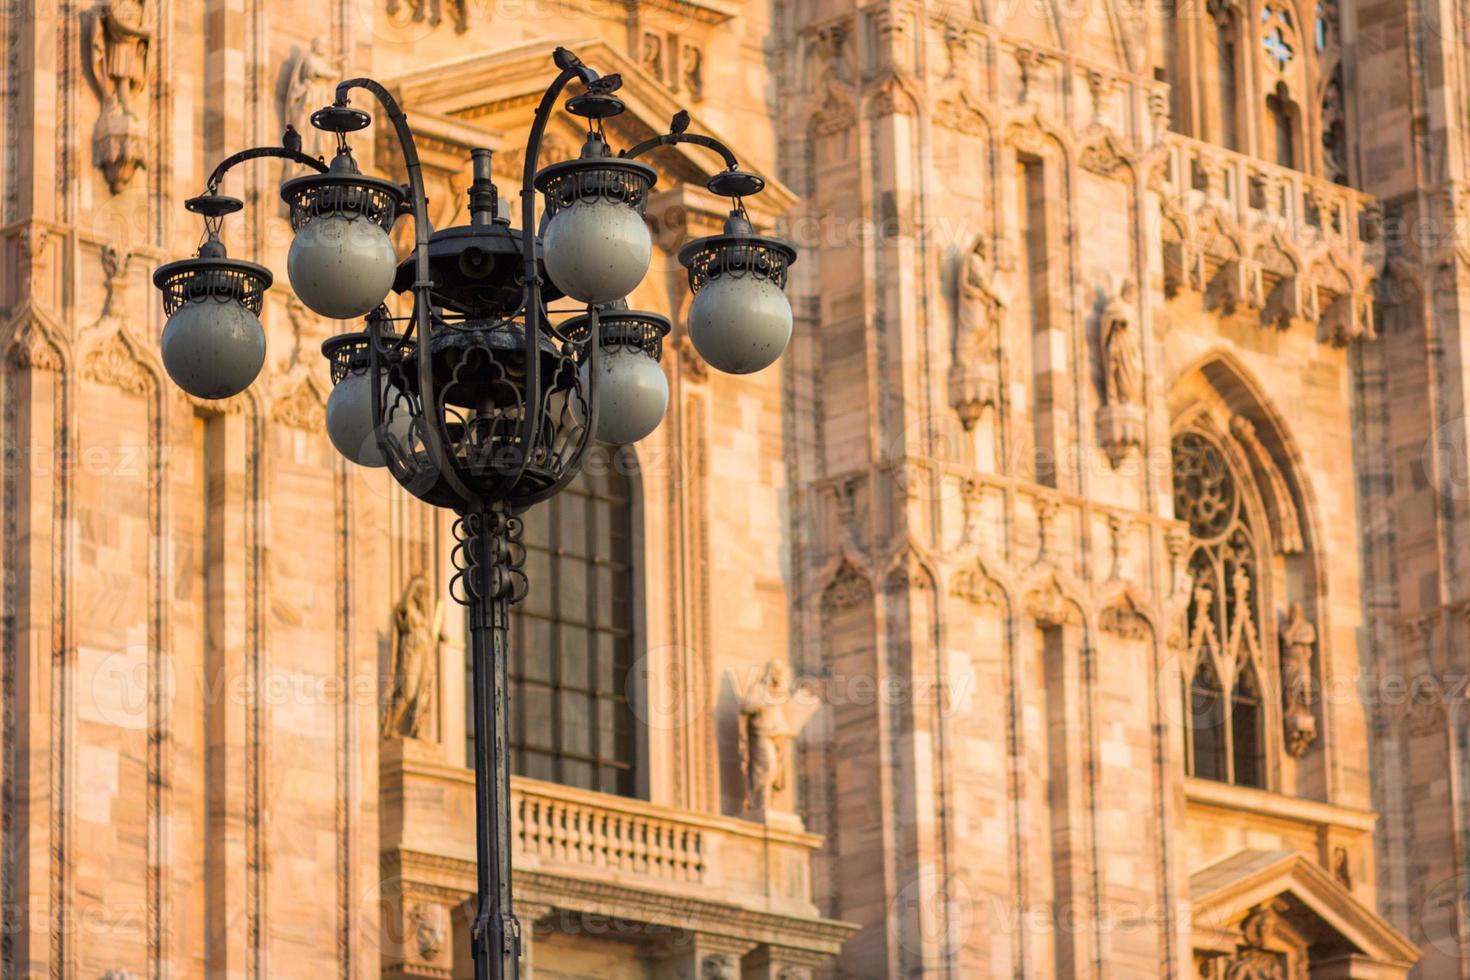 lampada al duomo di milano foto